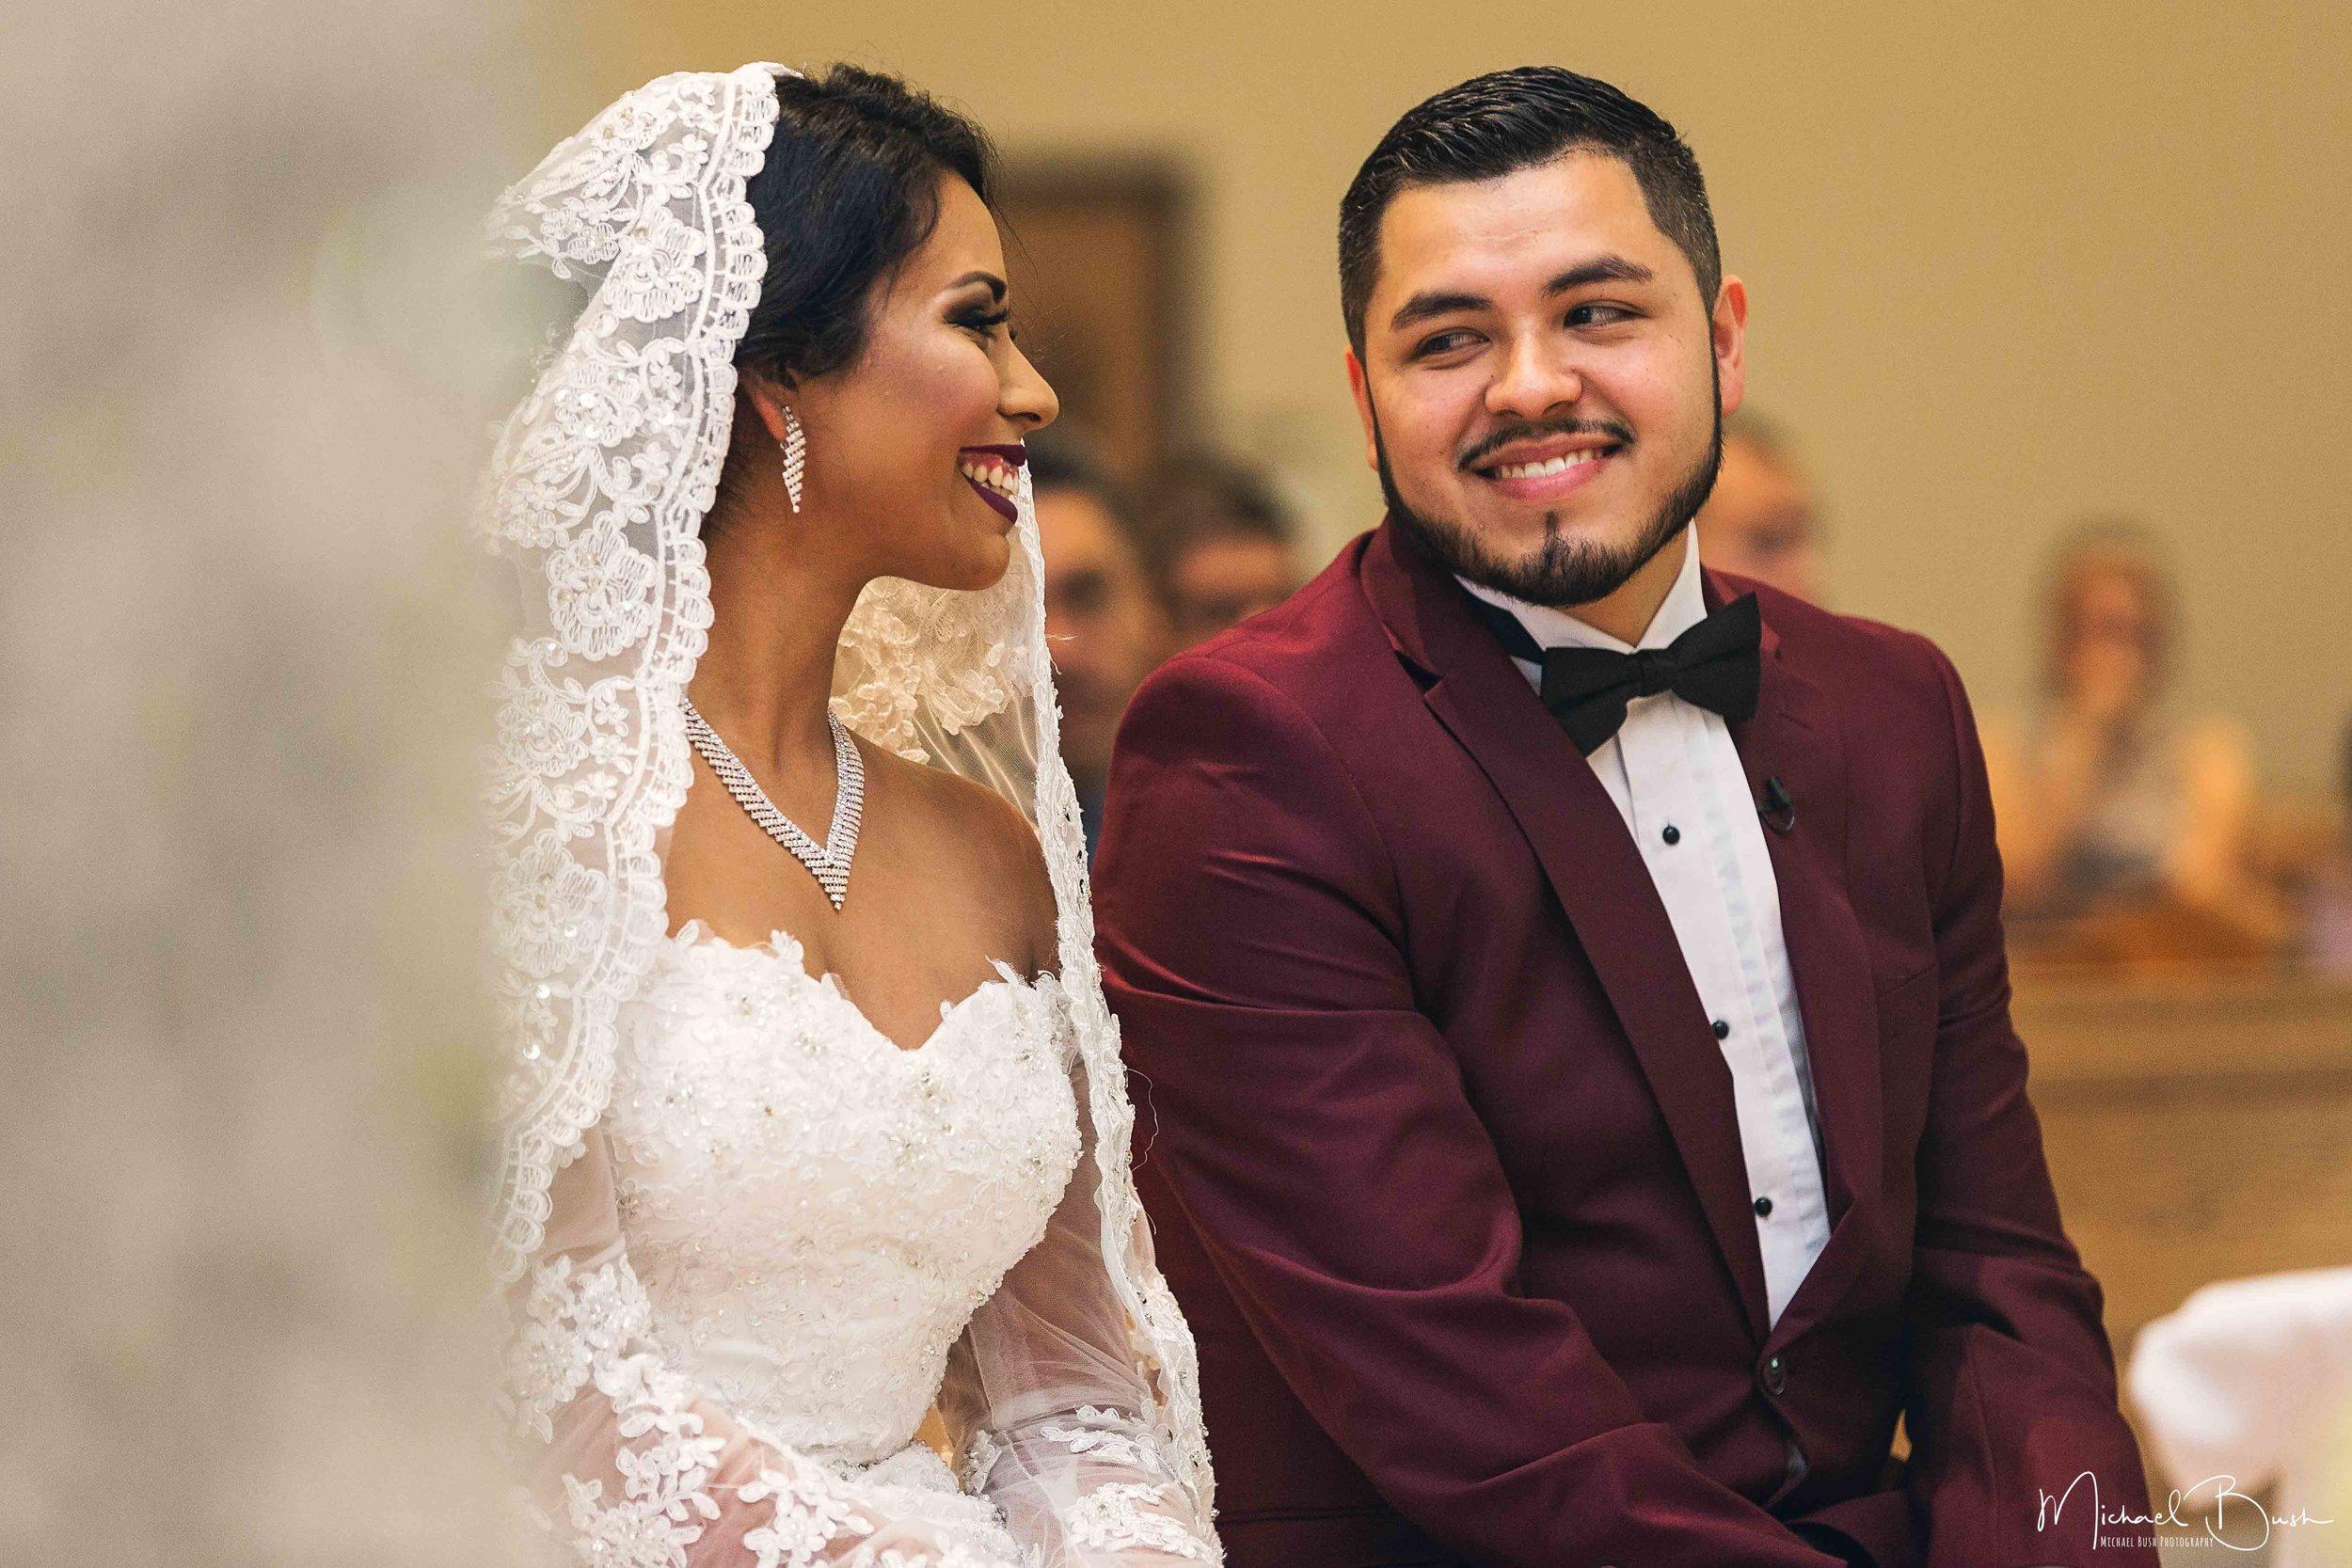 Wedding-Details-Bride-Fort Worth-colors-Ceremony-weddingceremony-brides-groom-ido-church-love.jpg